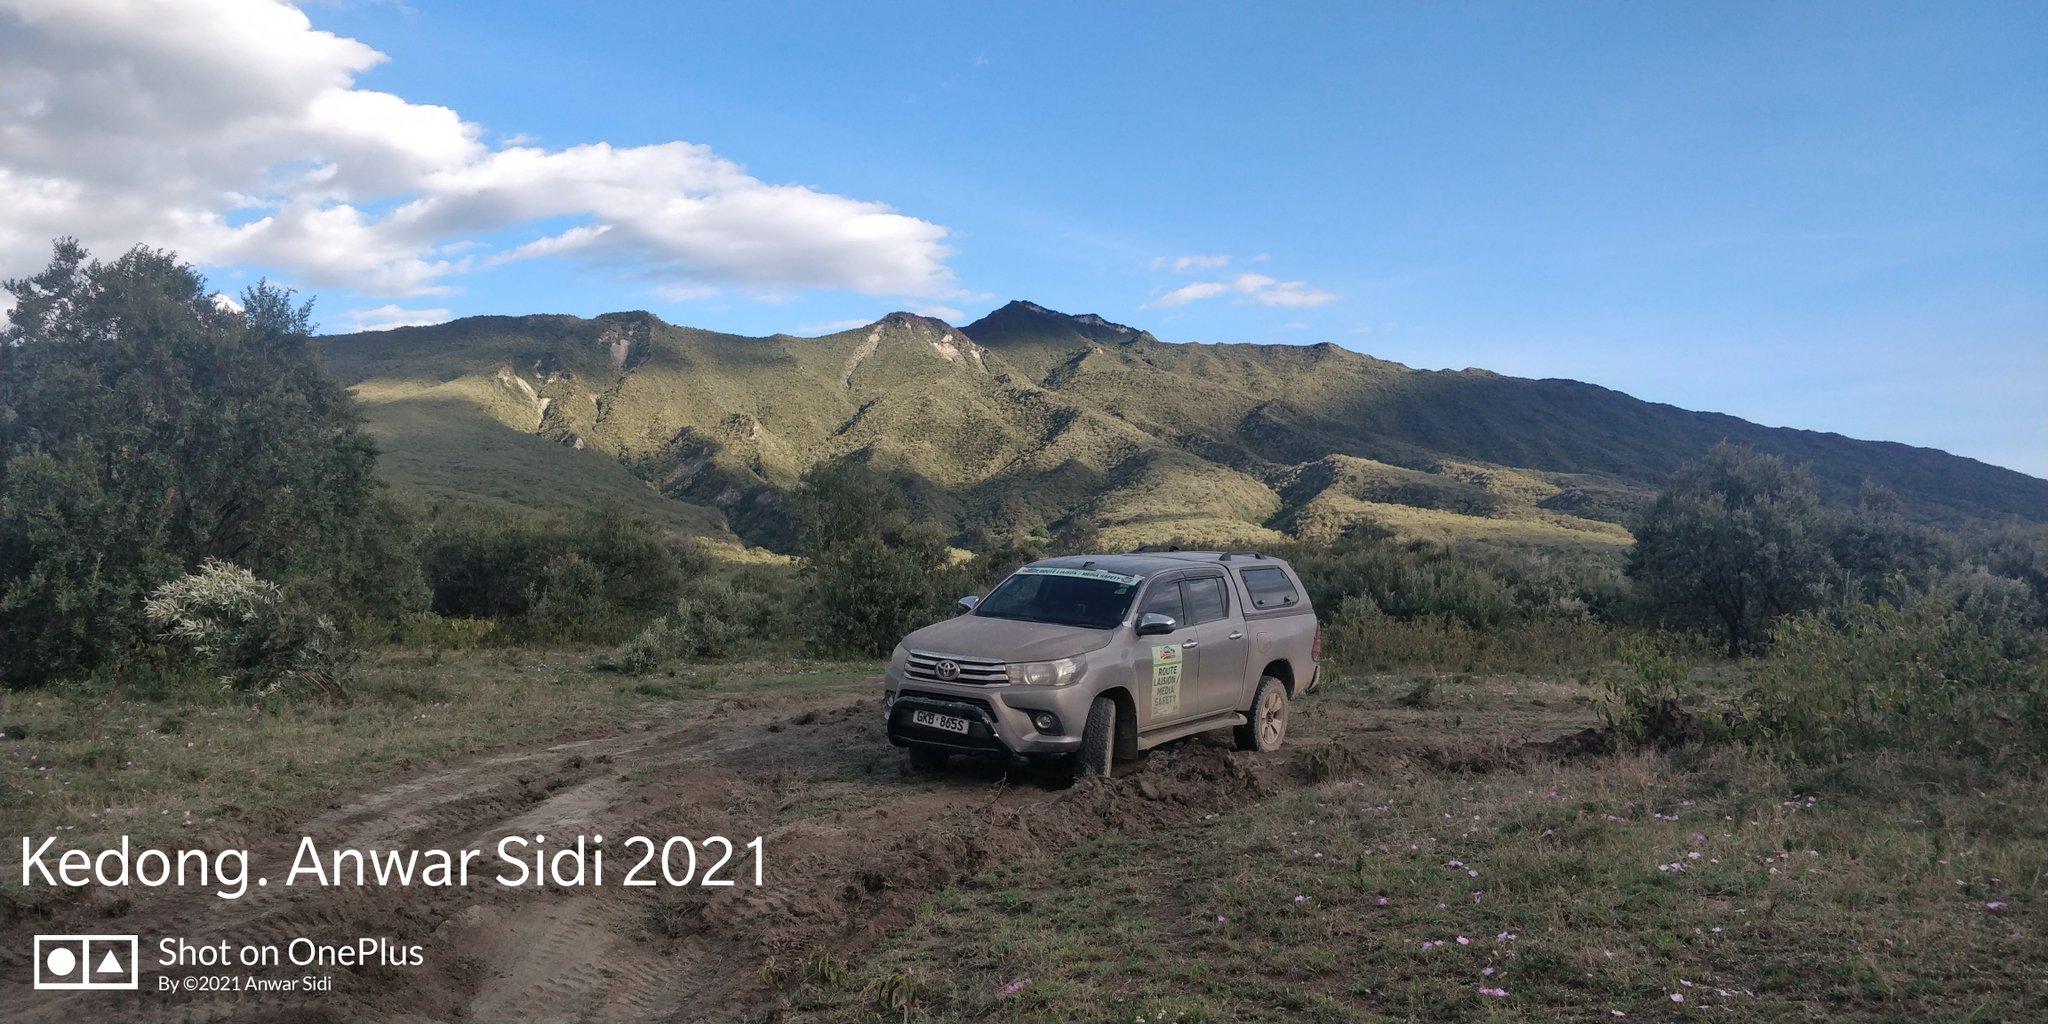 World Rally Championship: Temporada 2021  - Página 22 EzYsDwRWYAAbwvK?format=jpg&name=large